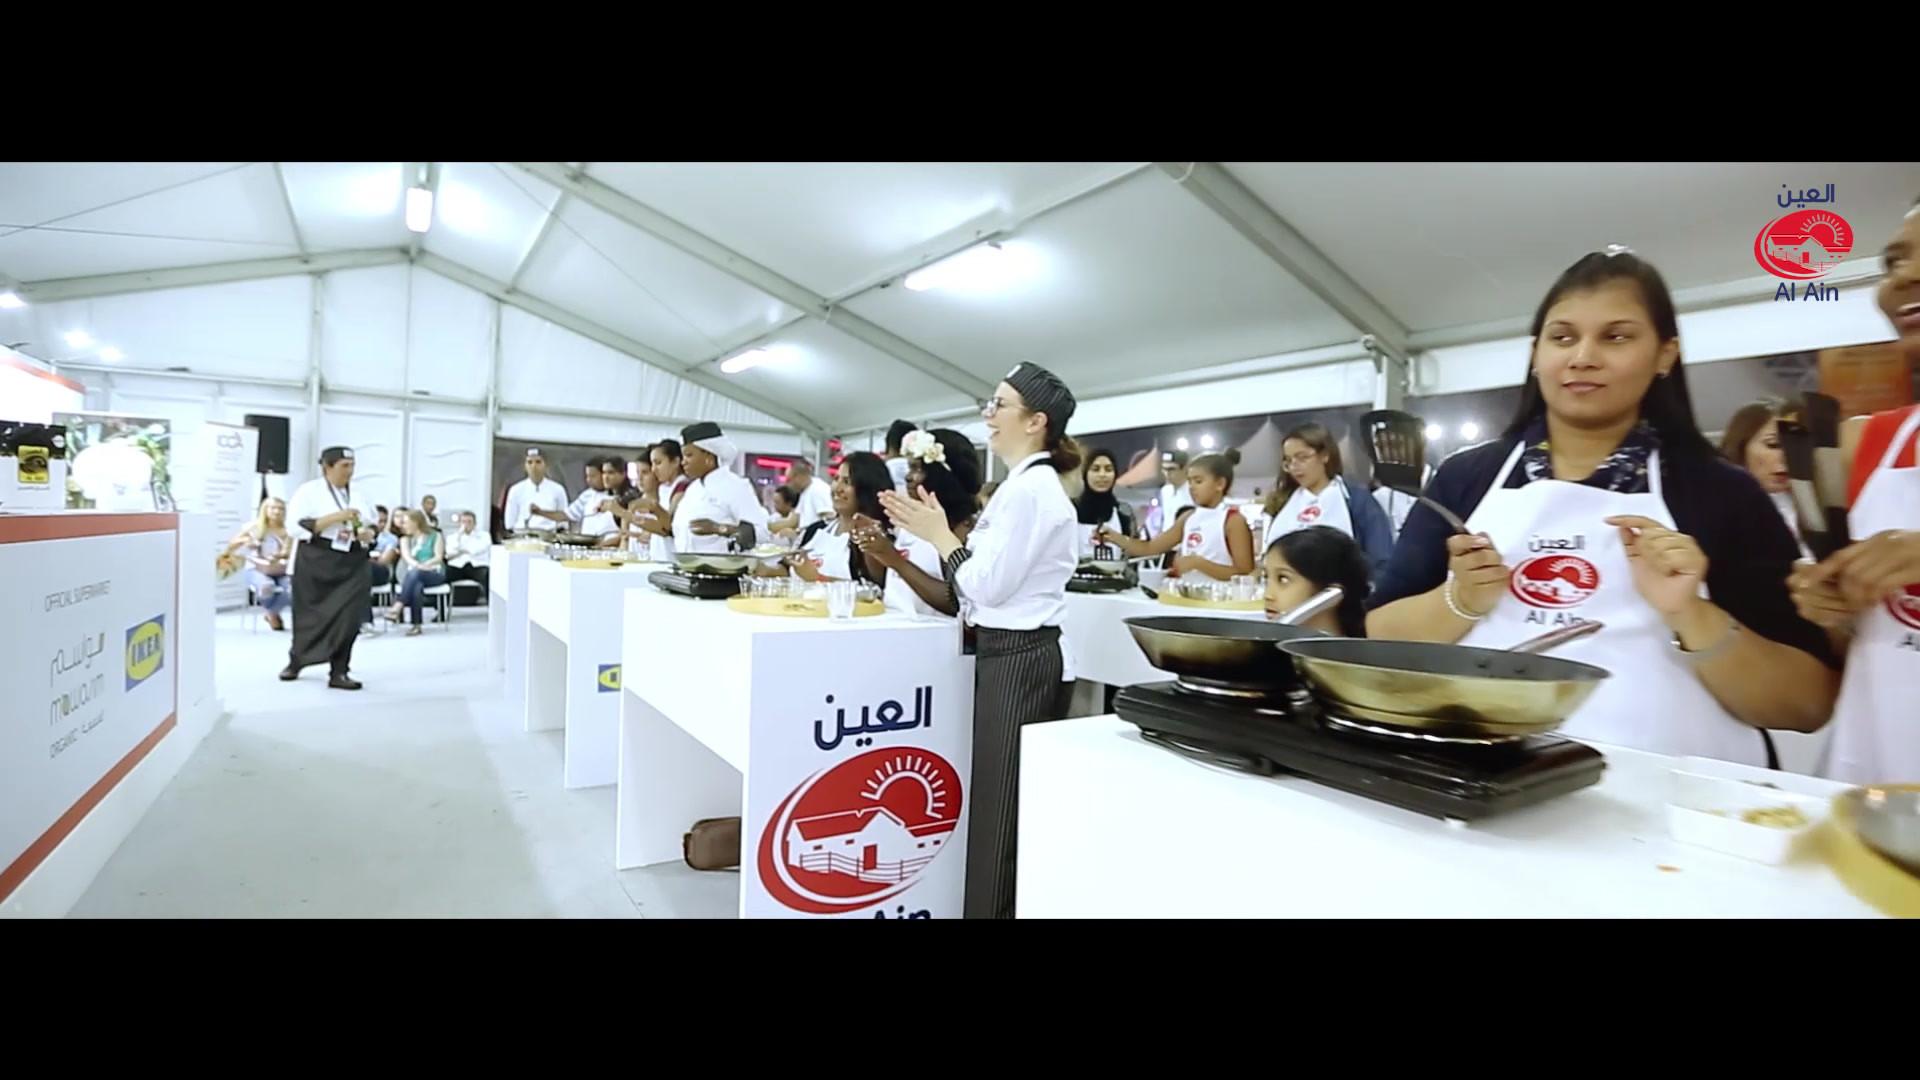 Al Ain Dairy Taste Of Abu Dhabi